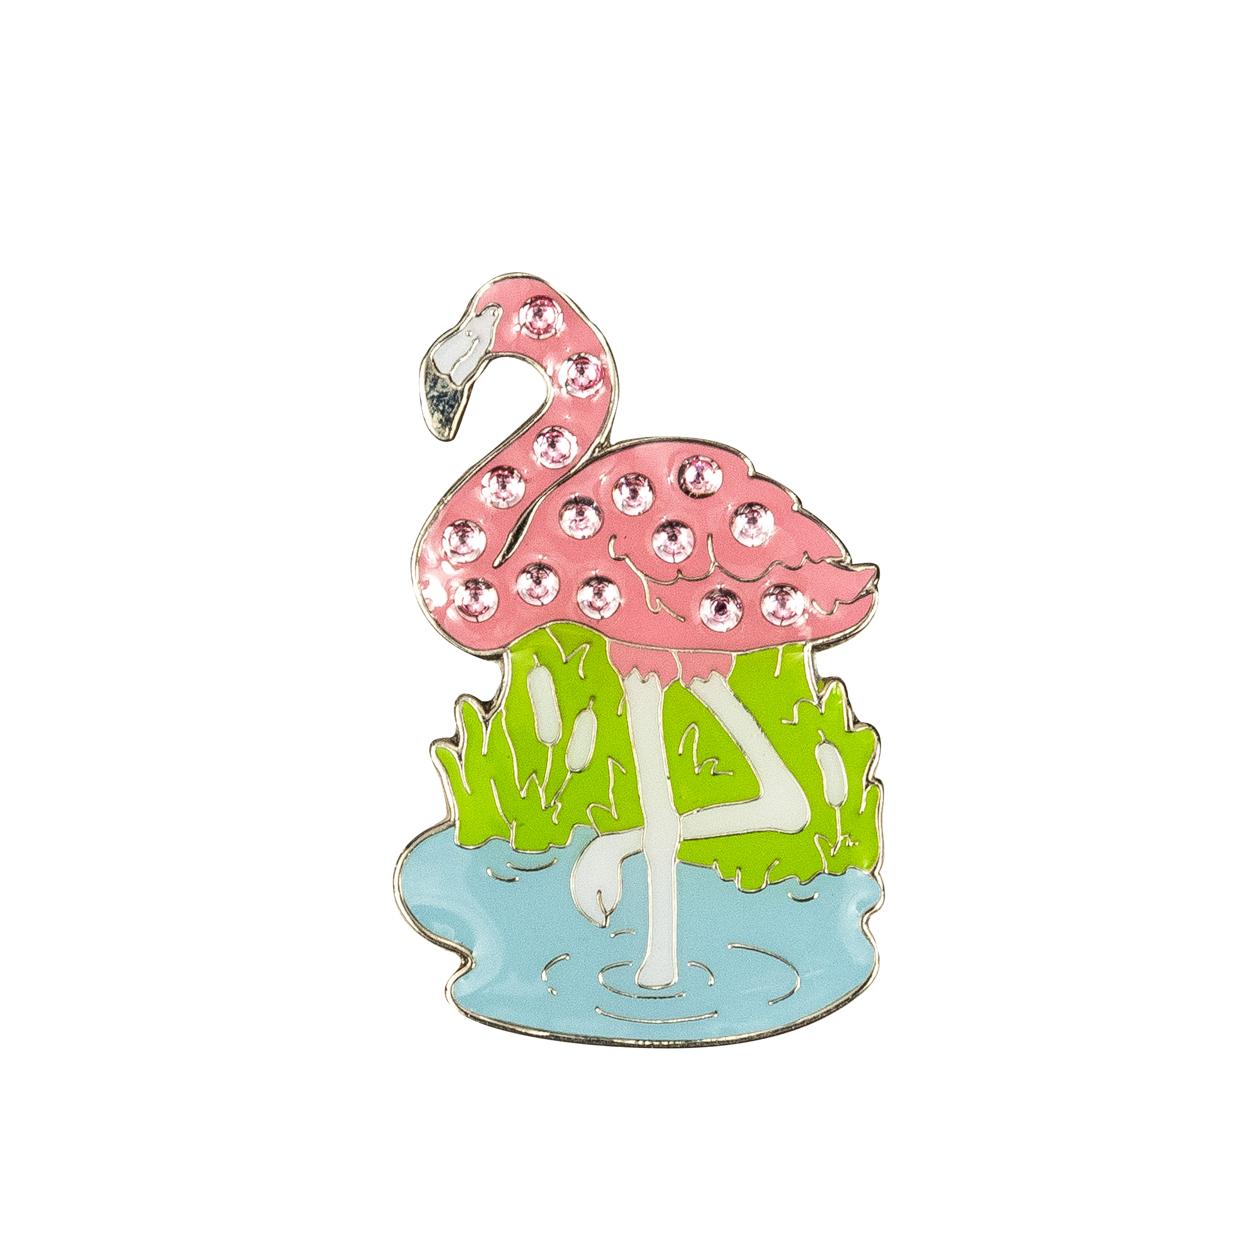 94. Flamingo